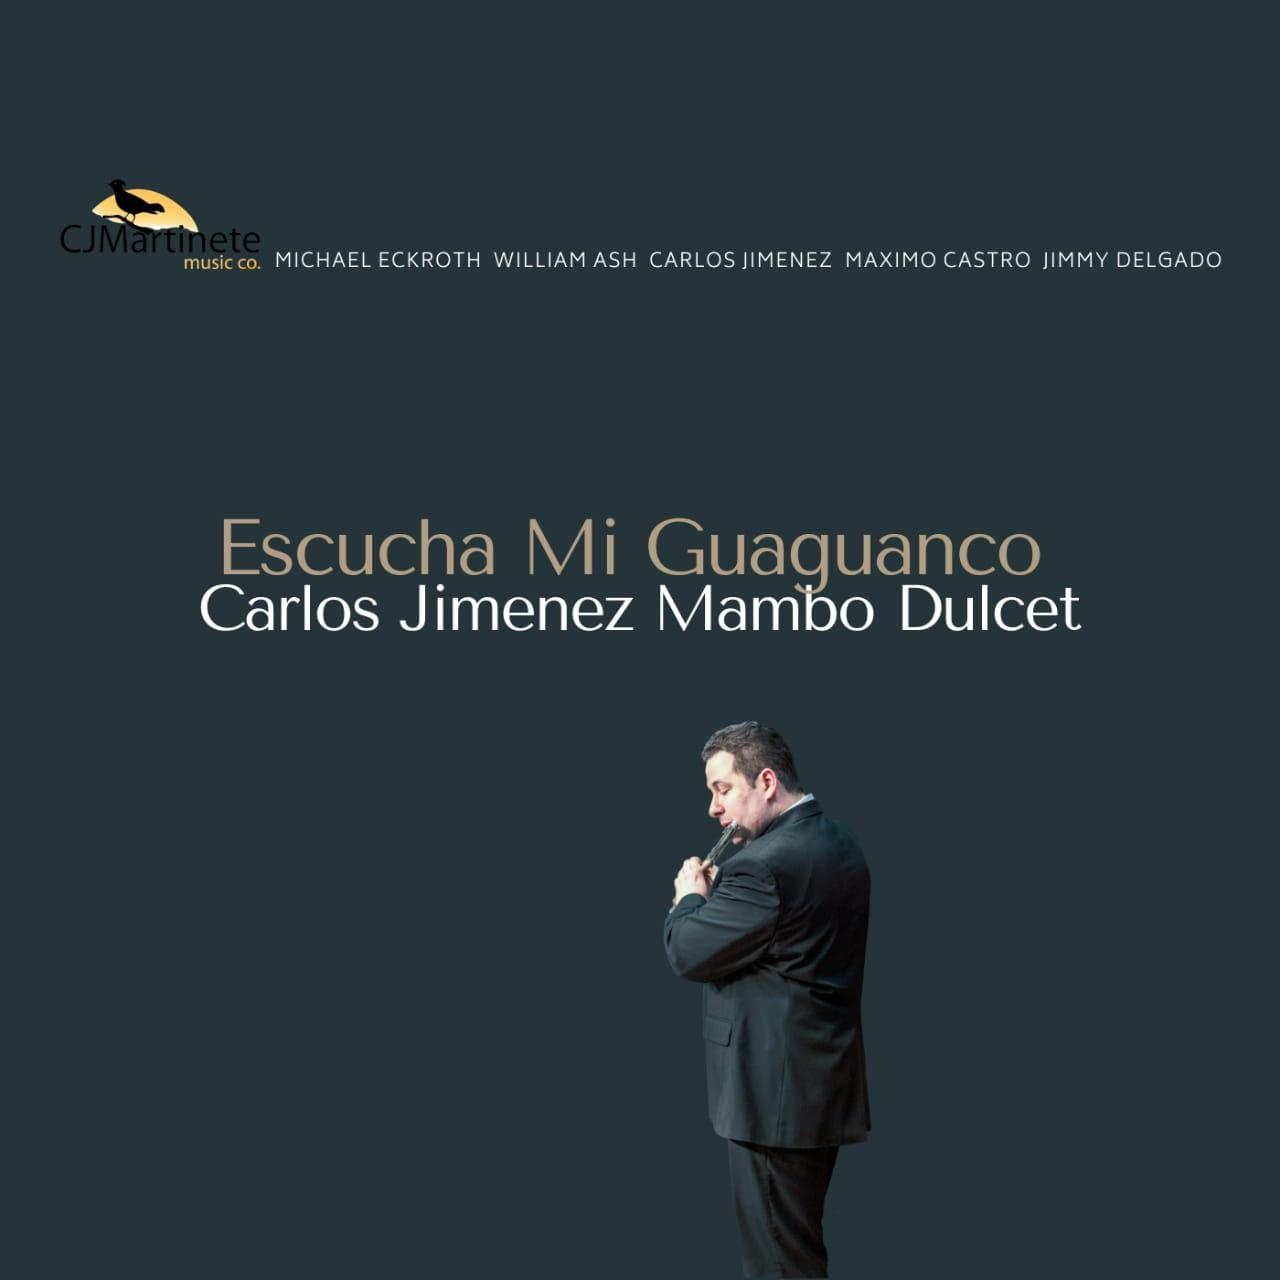 Escucha Mi Guaguanco - Carlos Jiménez Mambo Dulcet